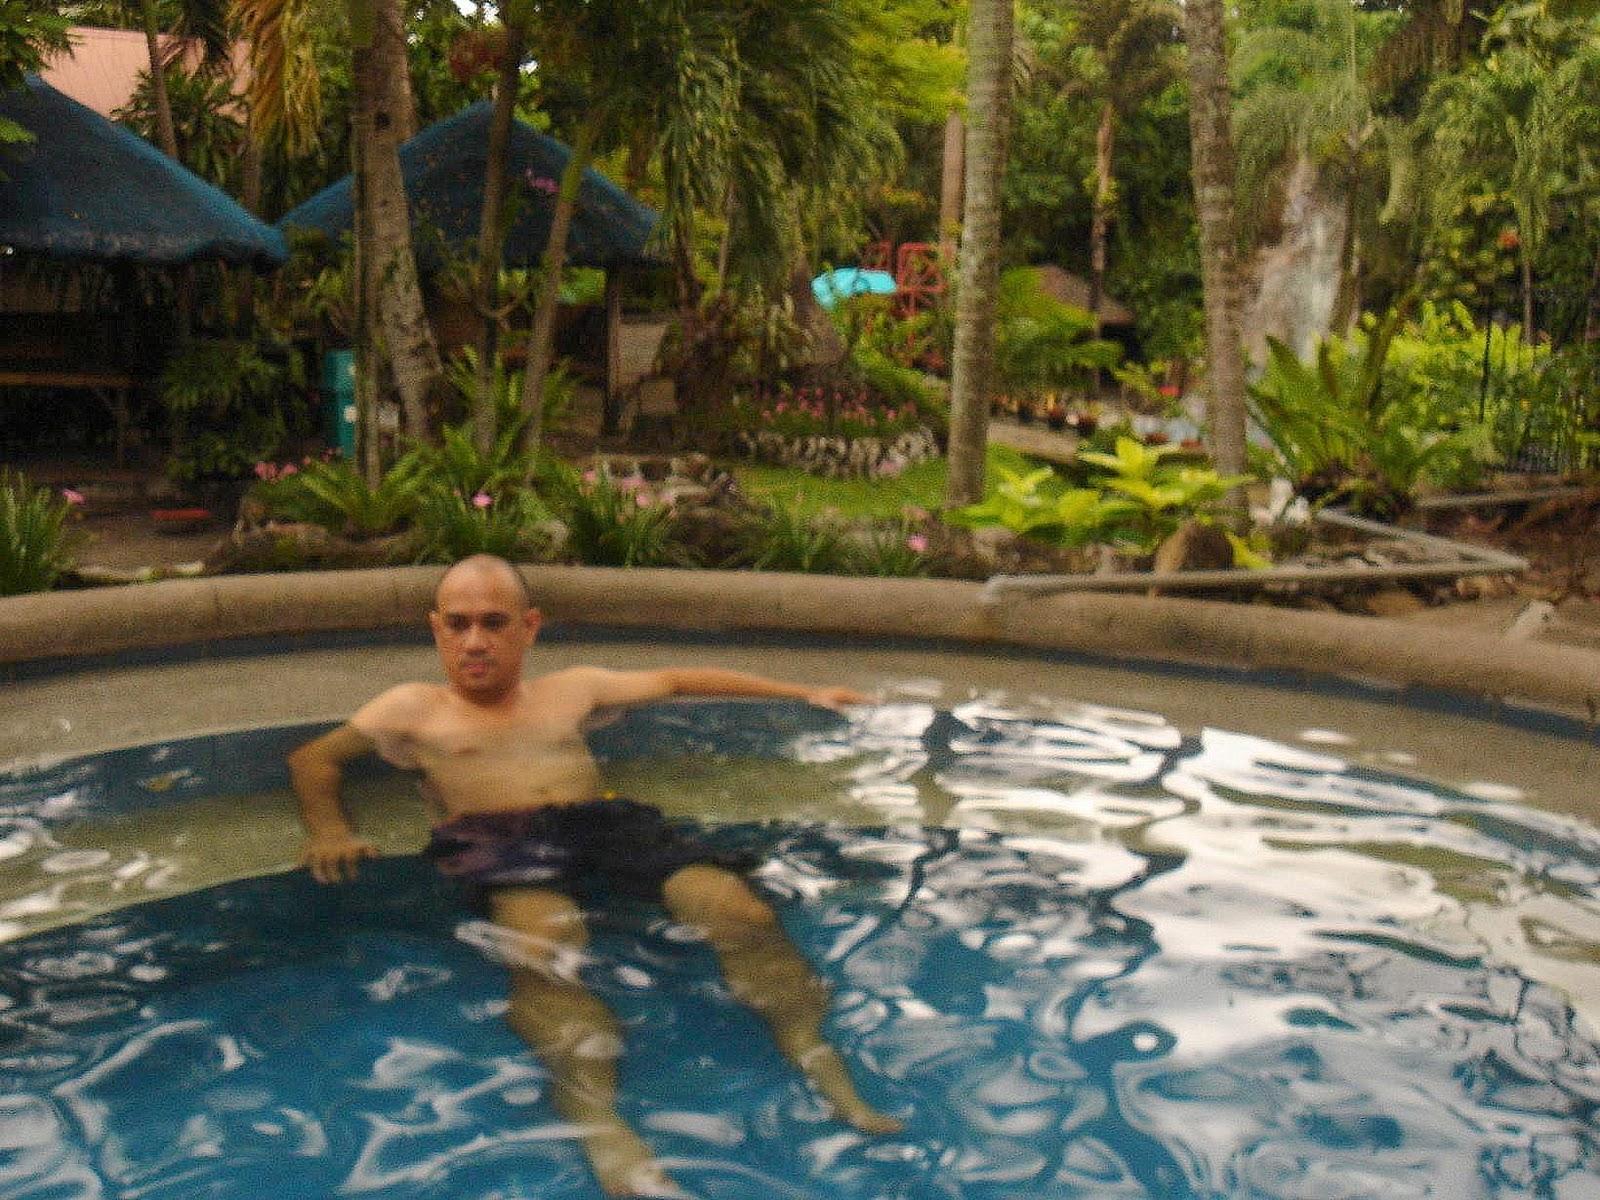 calamba hotsprings at dona jovita resort filipina explorer. Black Bedroom Furniture Sets. Home Design Ideas